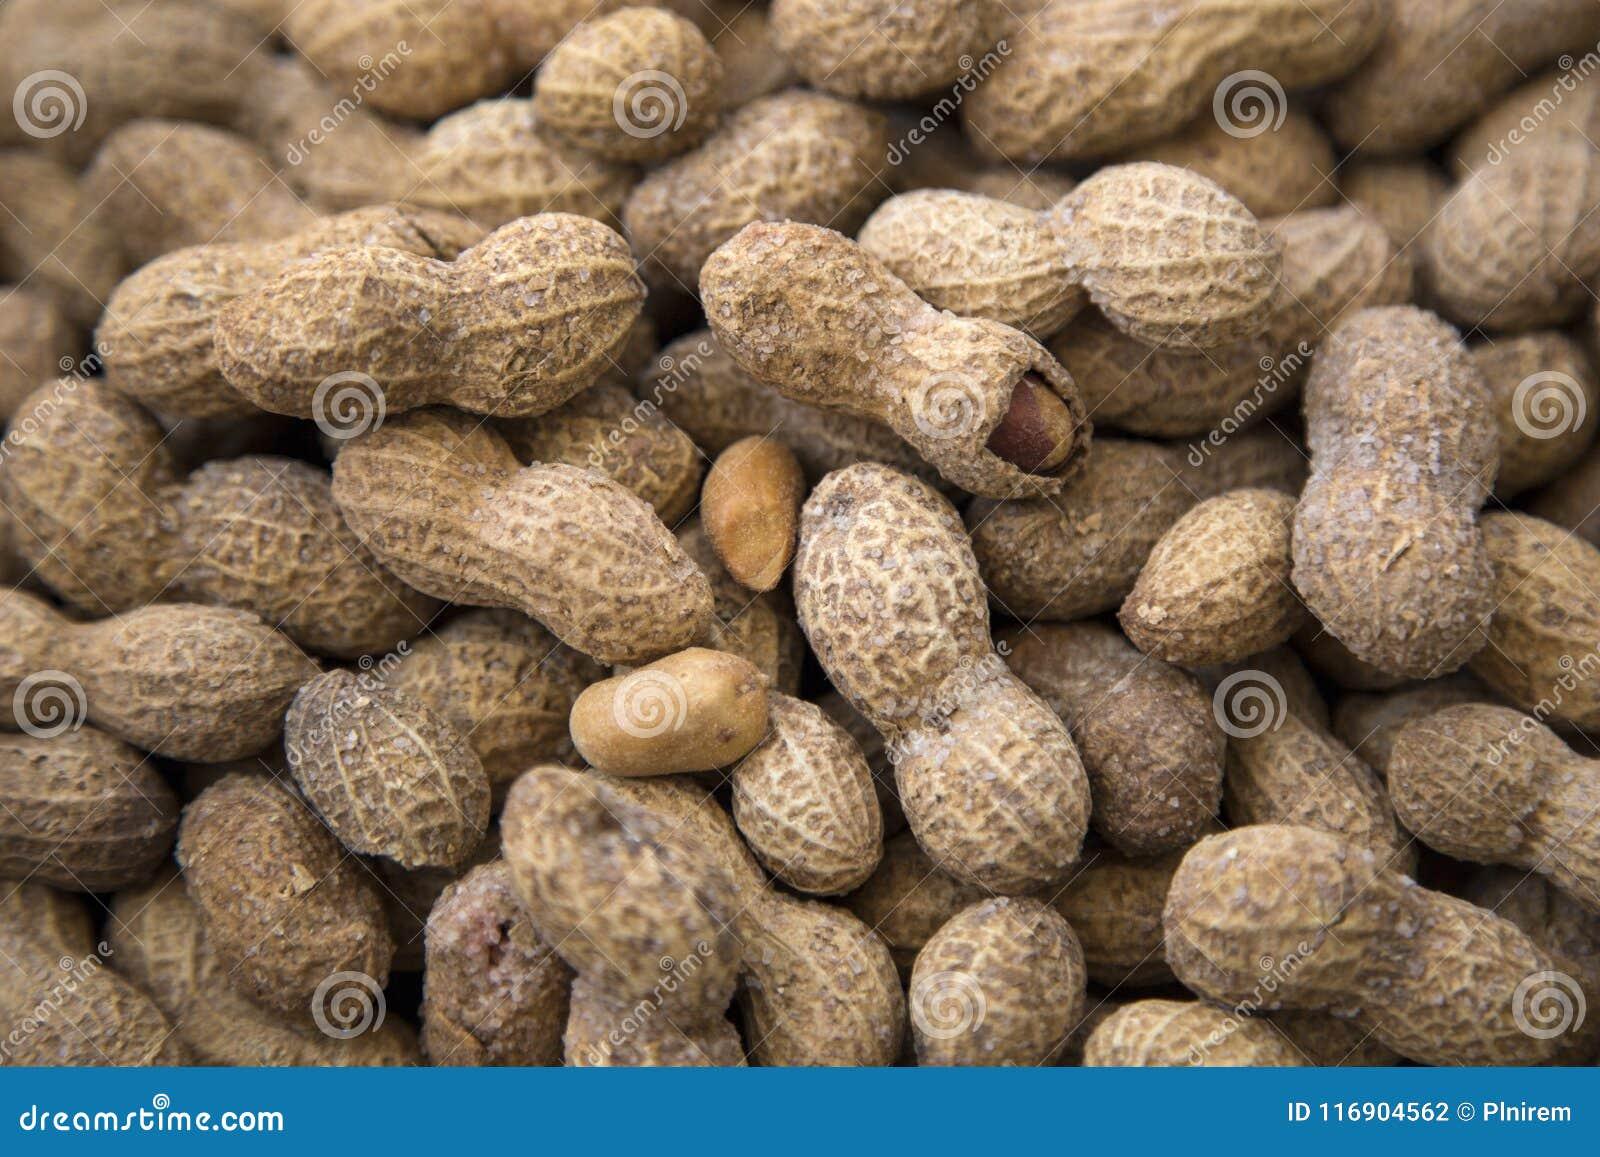 Salted peanuts or groundnut